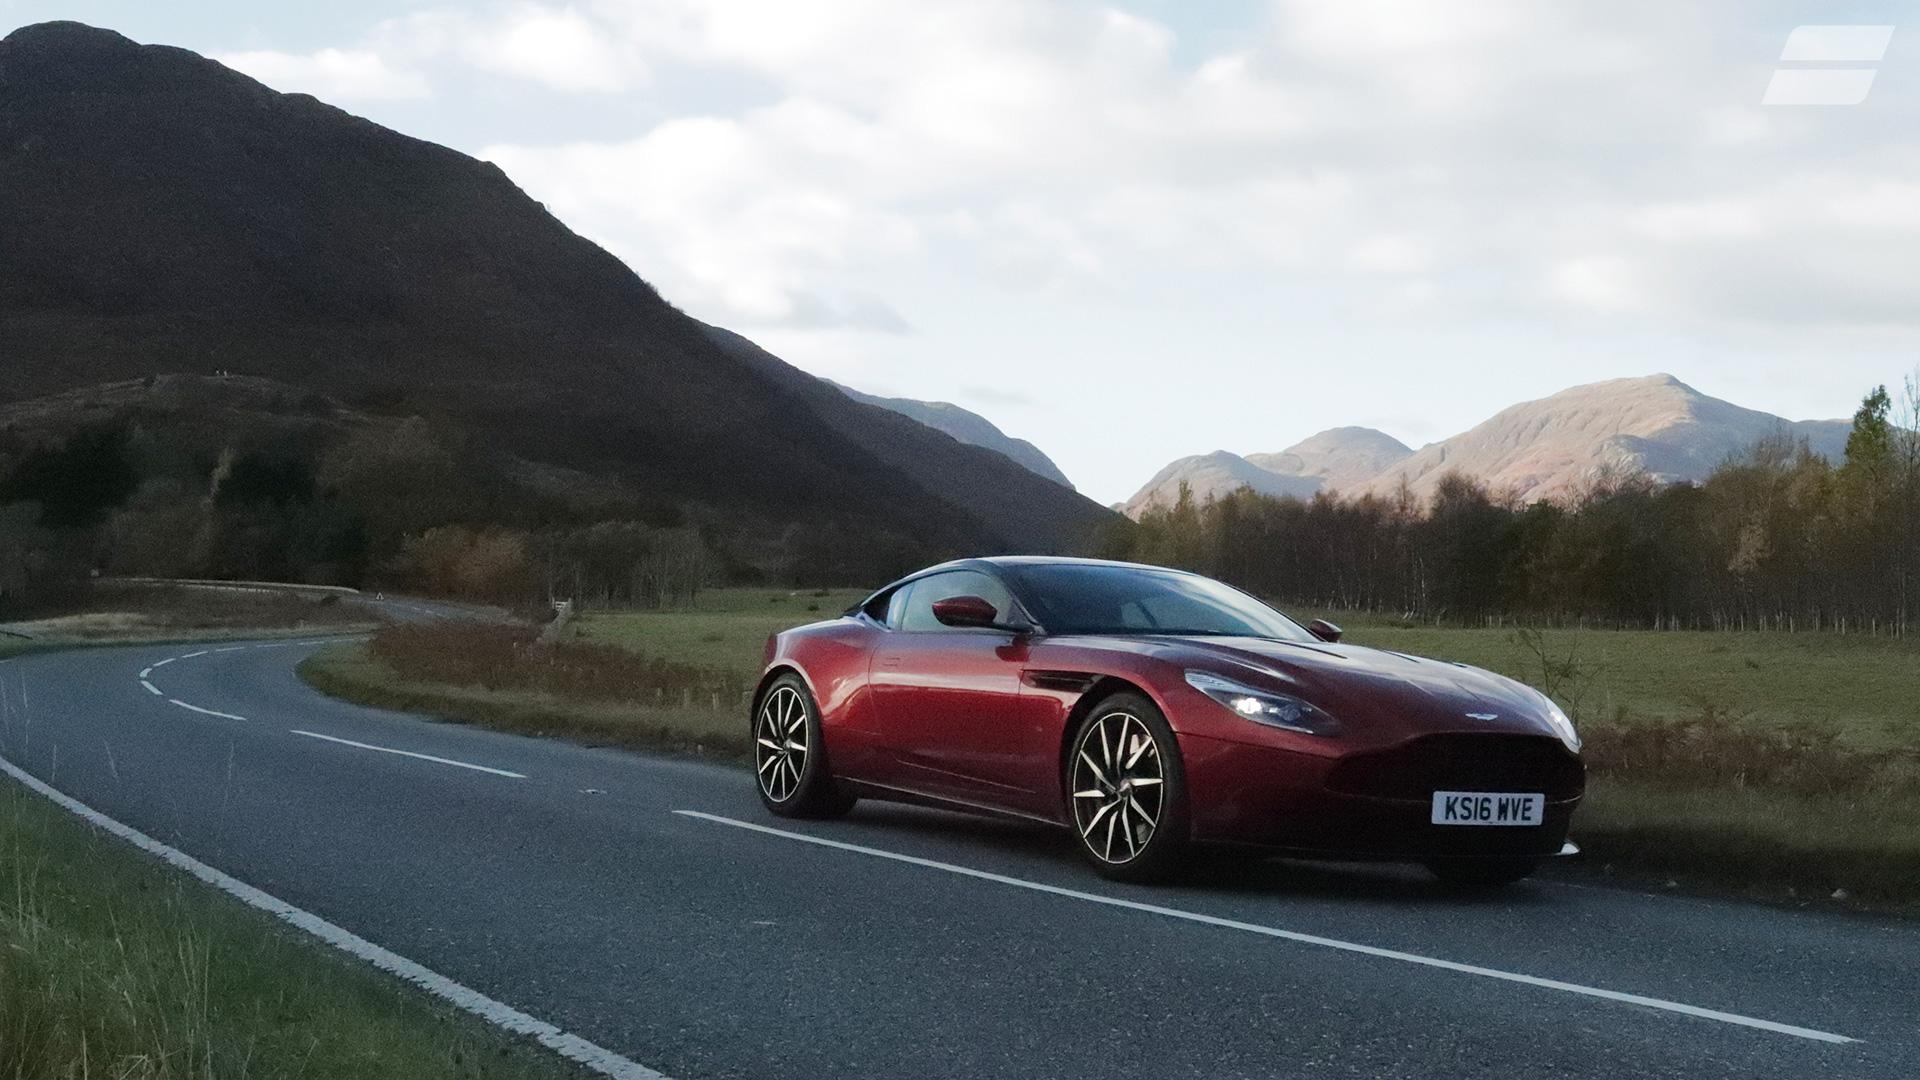 Aston Martin Car Reviews News Advice Auto Trader Uk